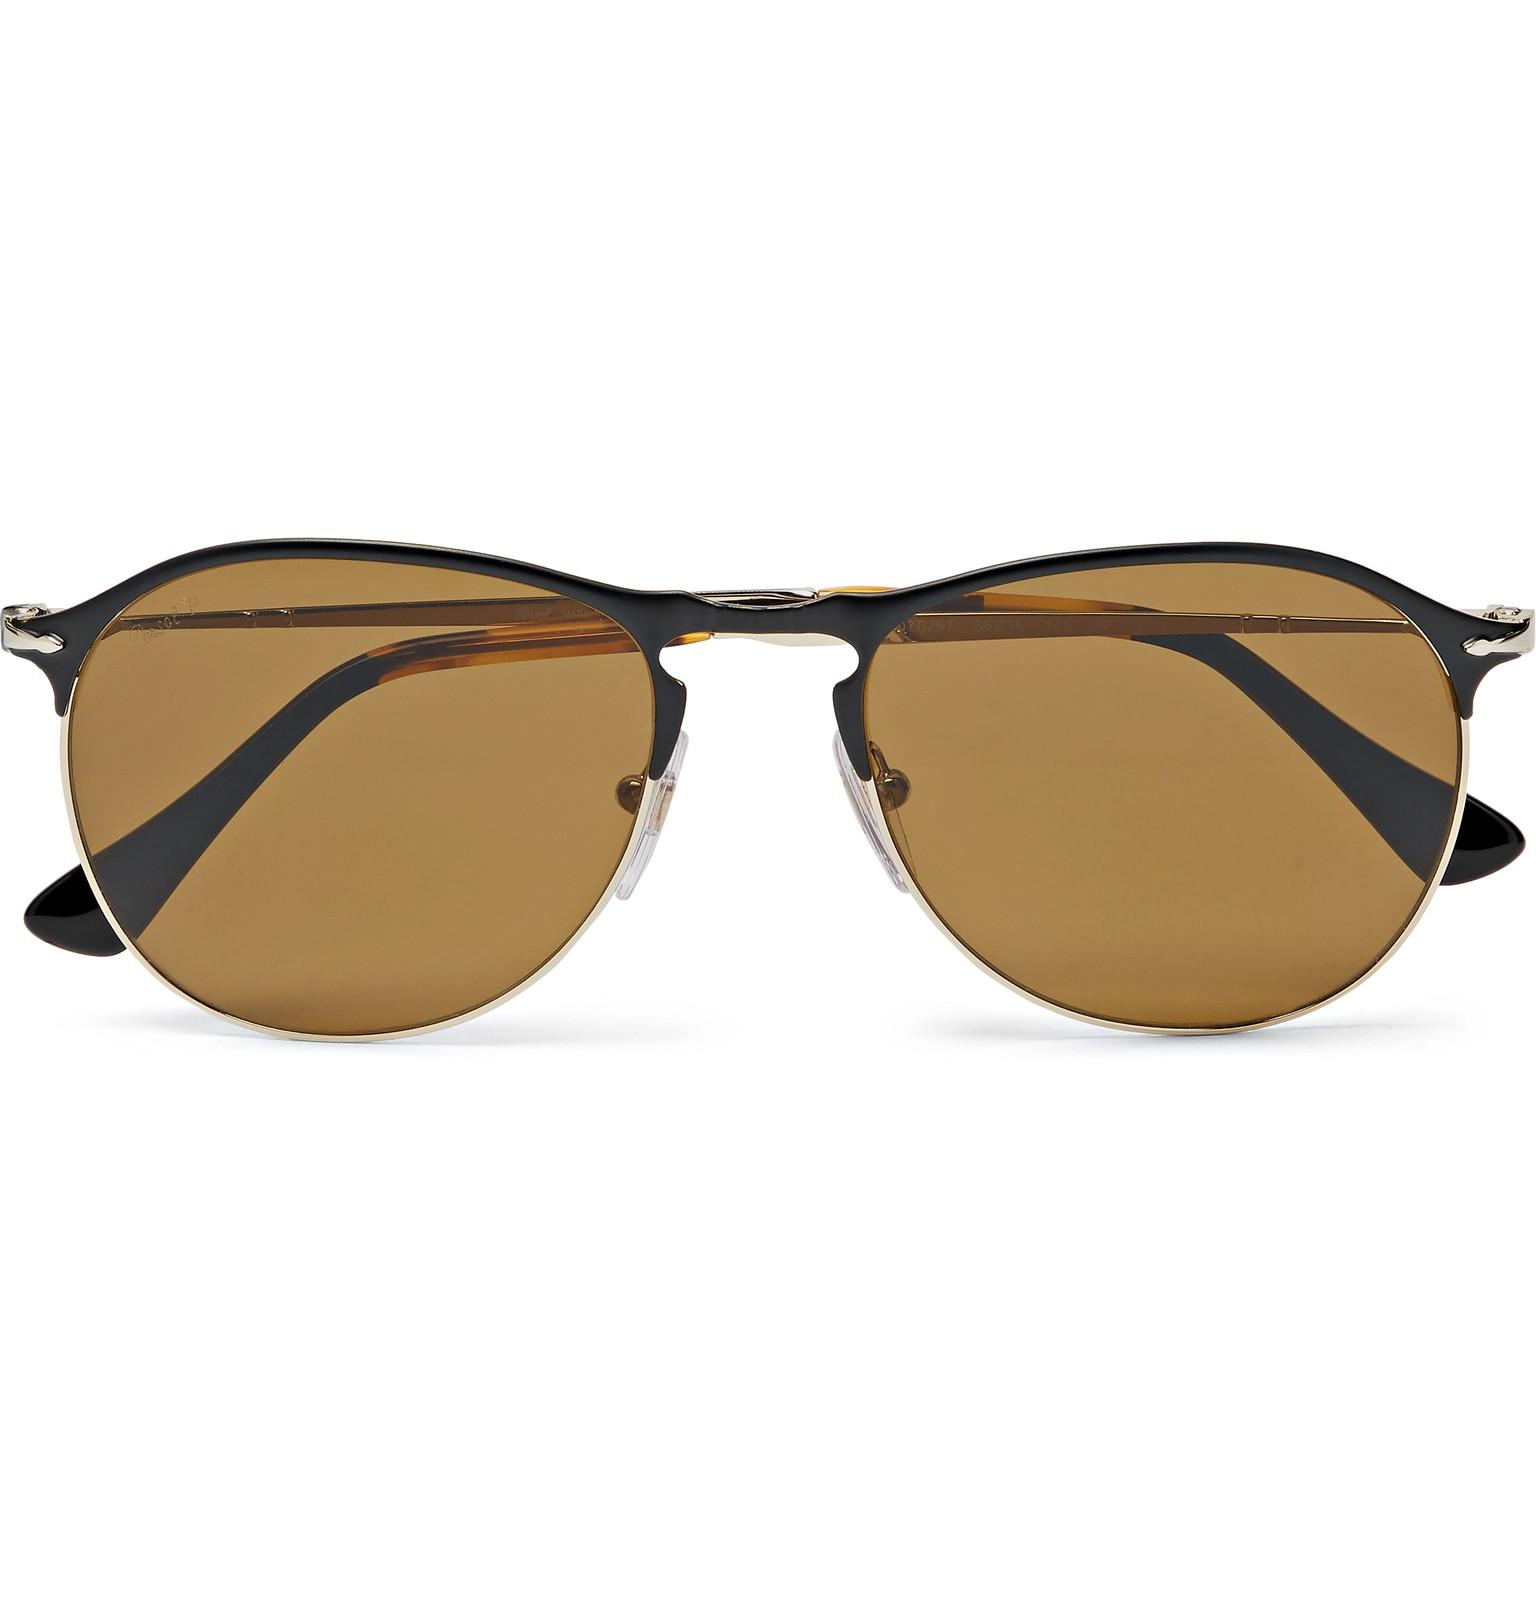 Persol Aviator-style Acetate Polarised Sunglasses - Black fi5aHEuQEg